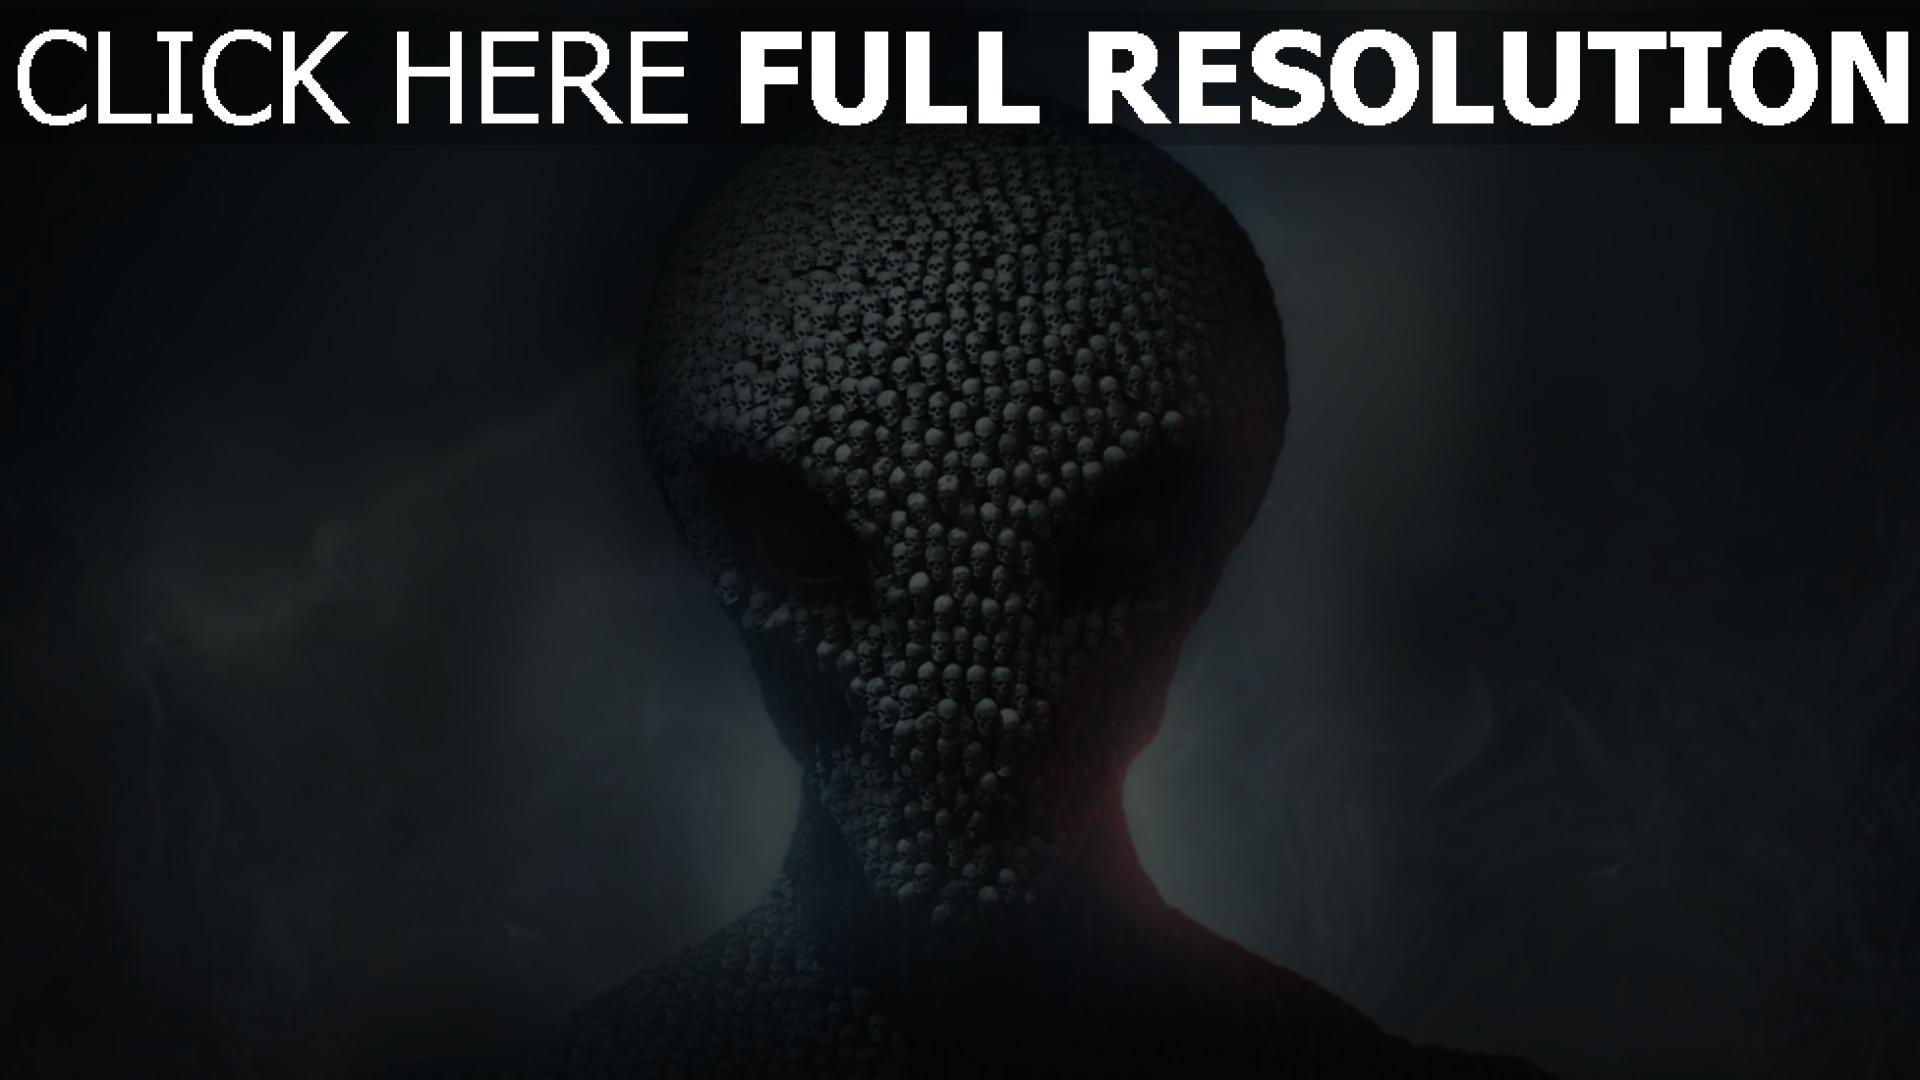 hd hintergrundbilder schädel xcom 2 alien firaxis games 1920x1080